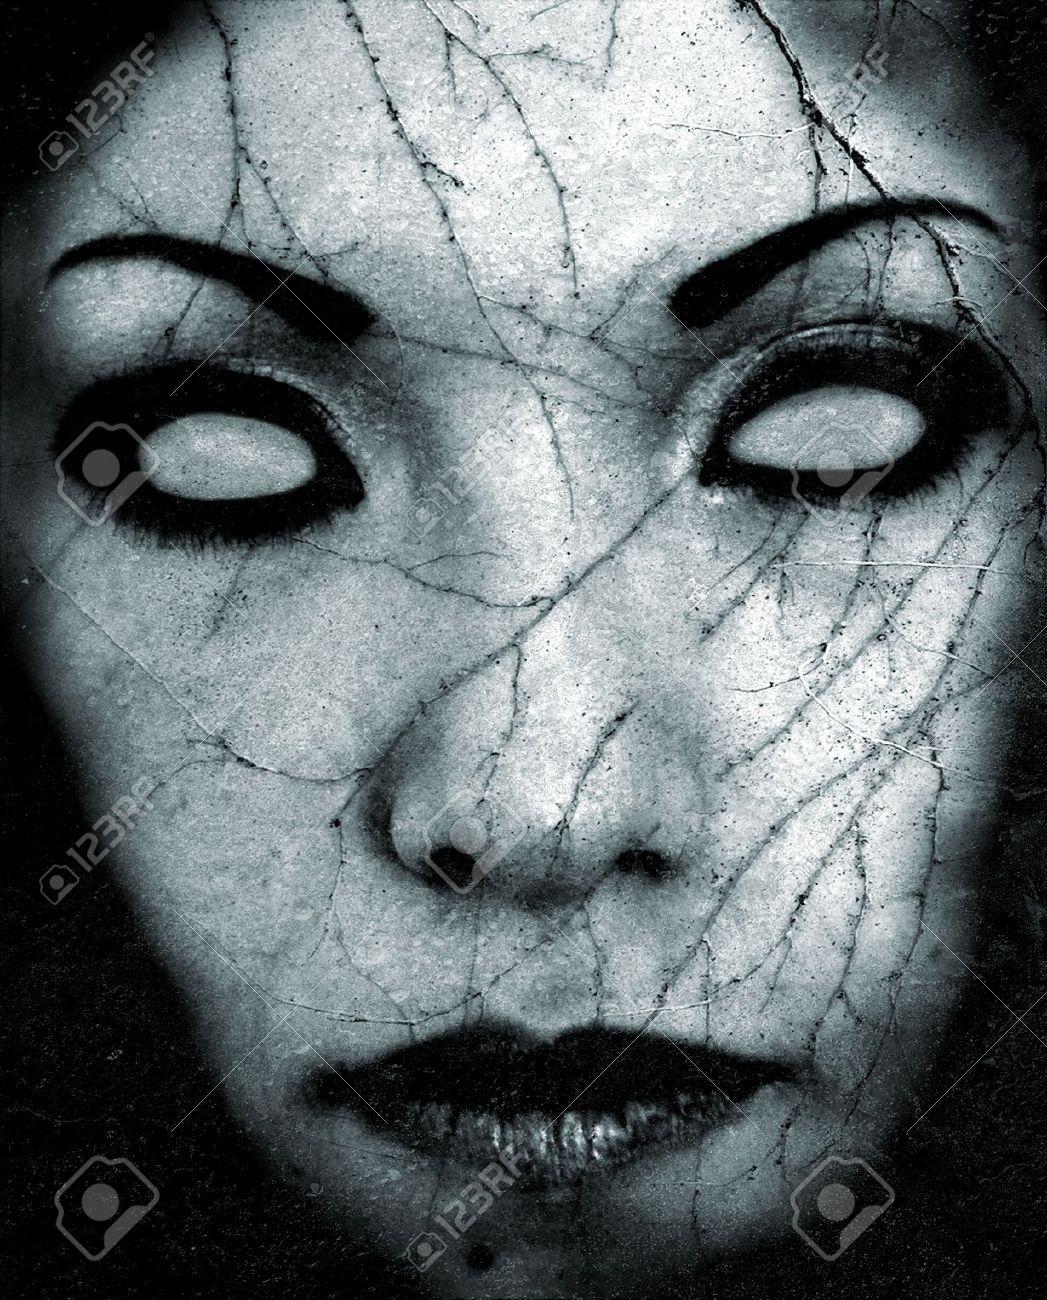 Horror: Horror Face Stock Photos Images, Royalty Free Horror Face